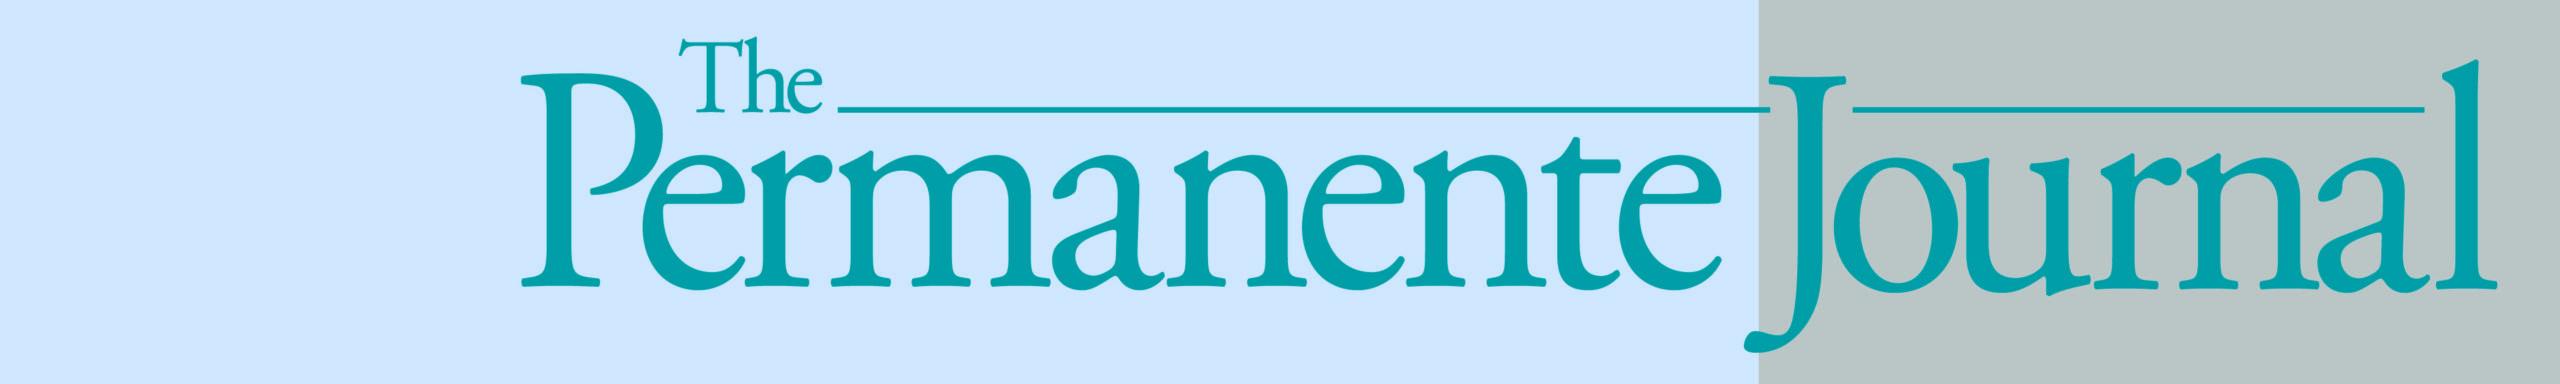 The Permanente Journal logo